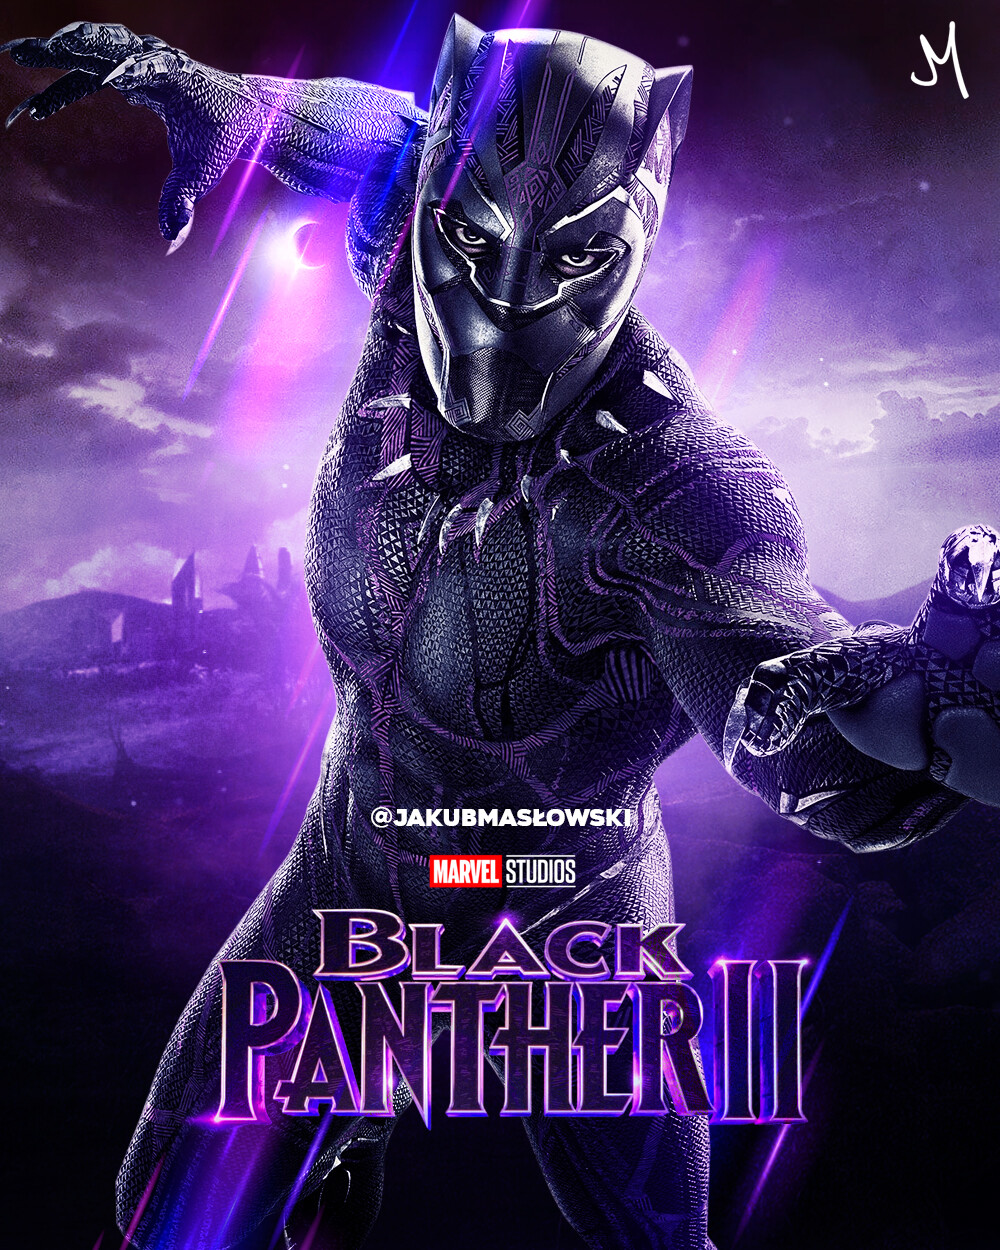 Artstation Black Panther Ii Jakub Maslowski